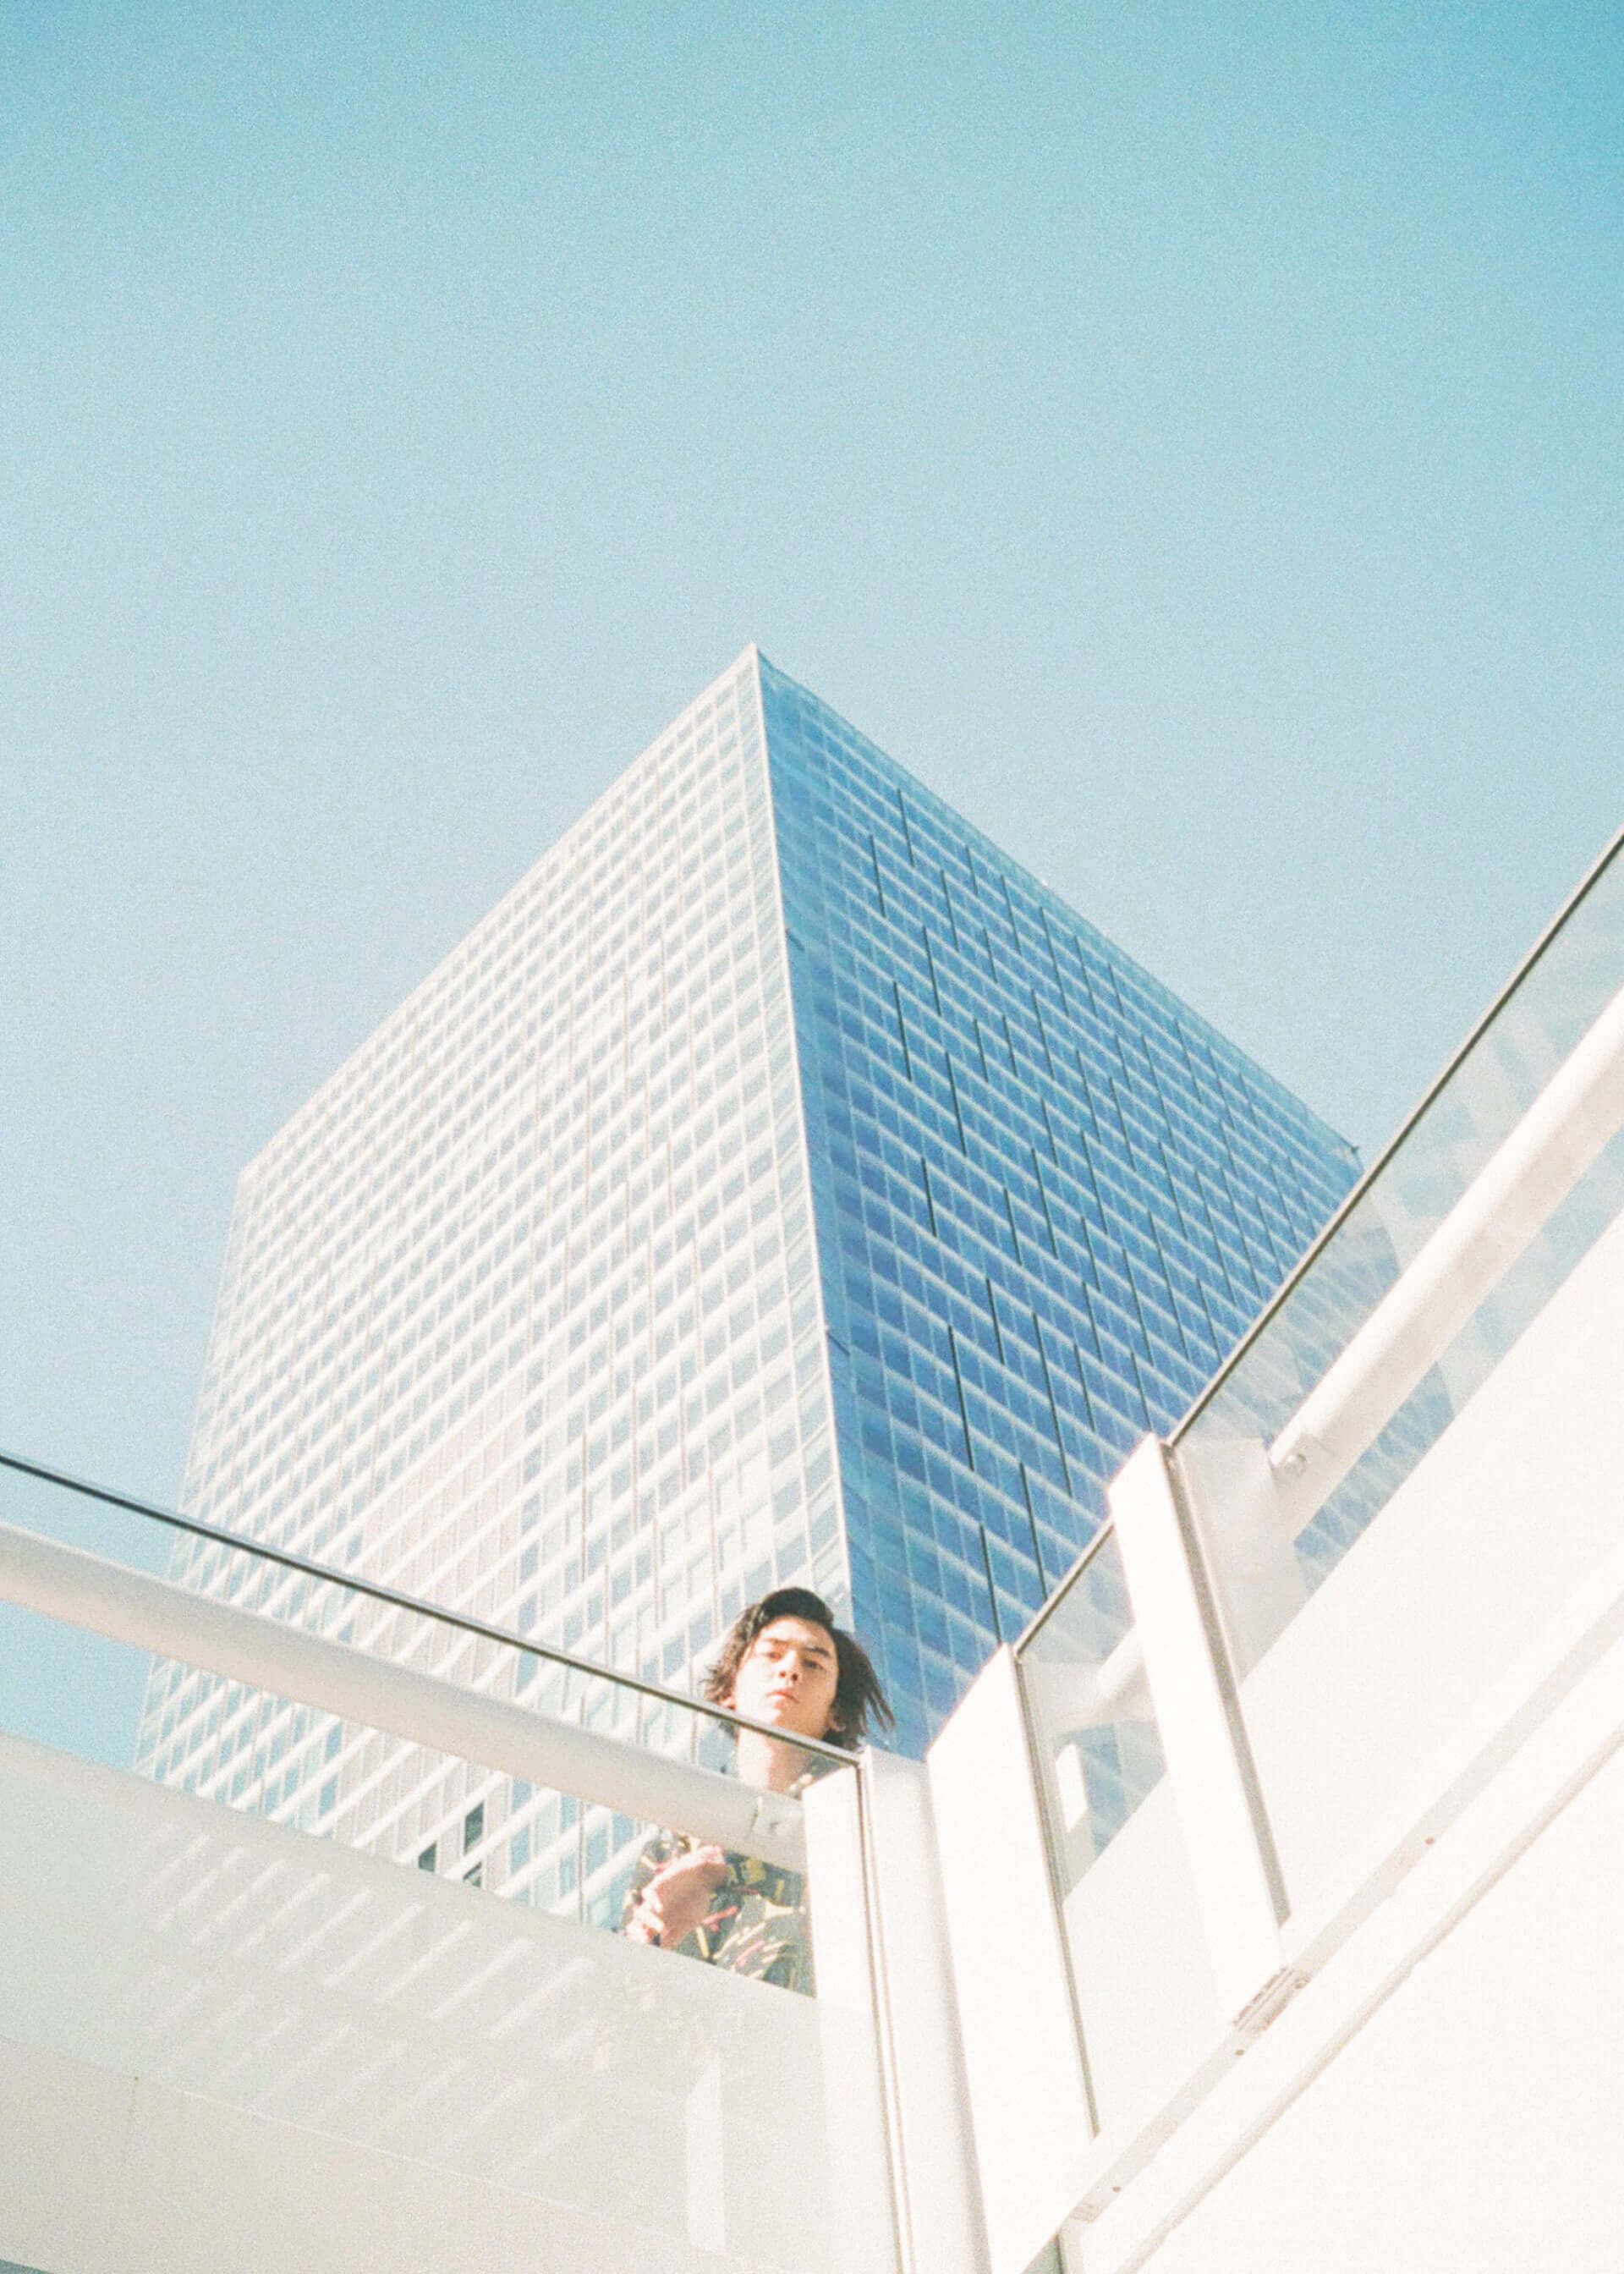 【25's view】岩渕 想太|25人の25歳へインタビュー interview_191120_iwabuchi_3-1920x2688